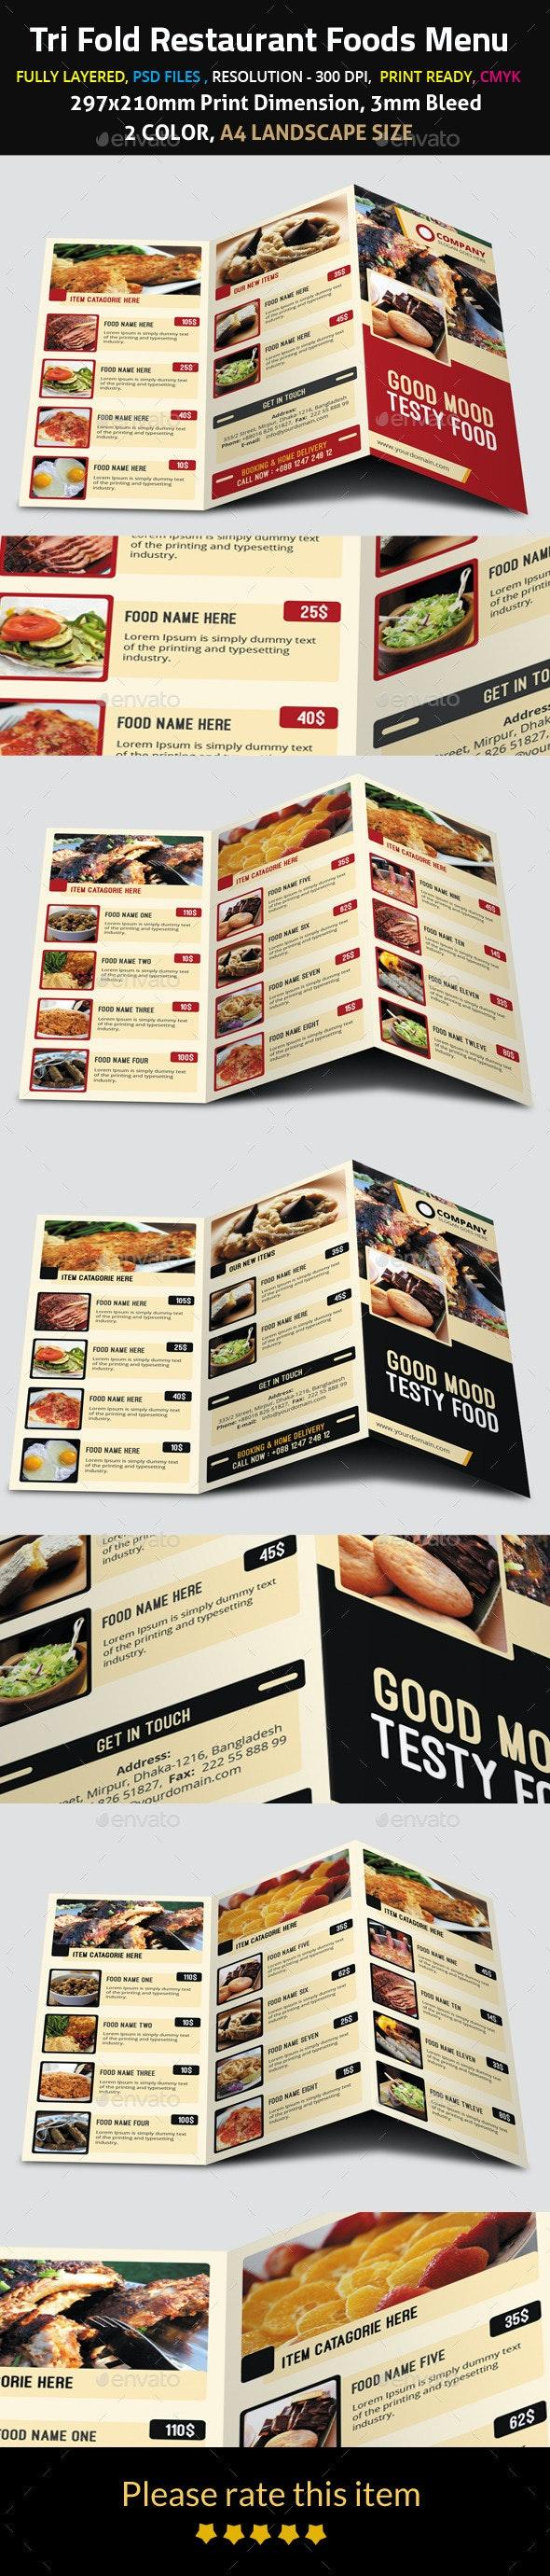 Tri Fold Restaurant Foods Menu